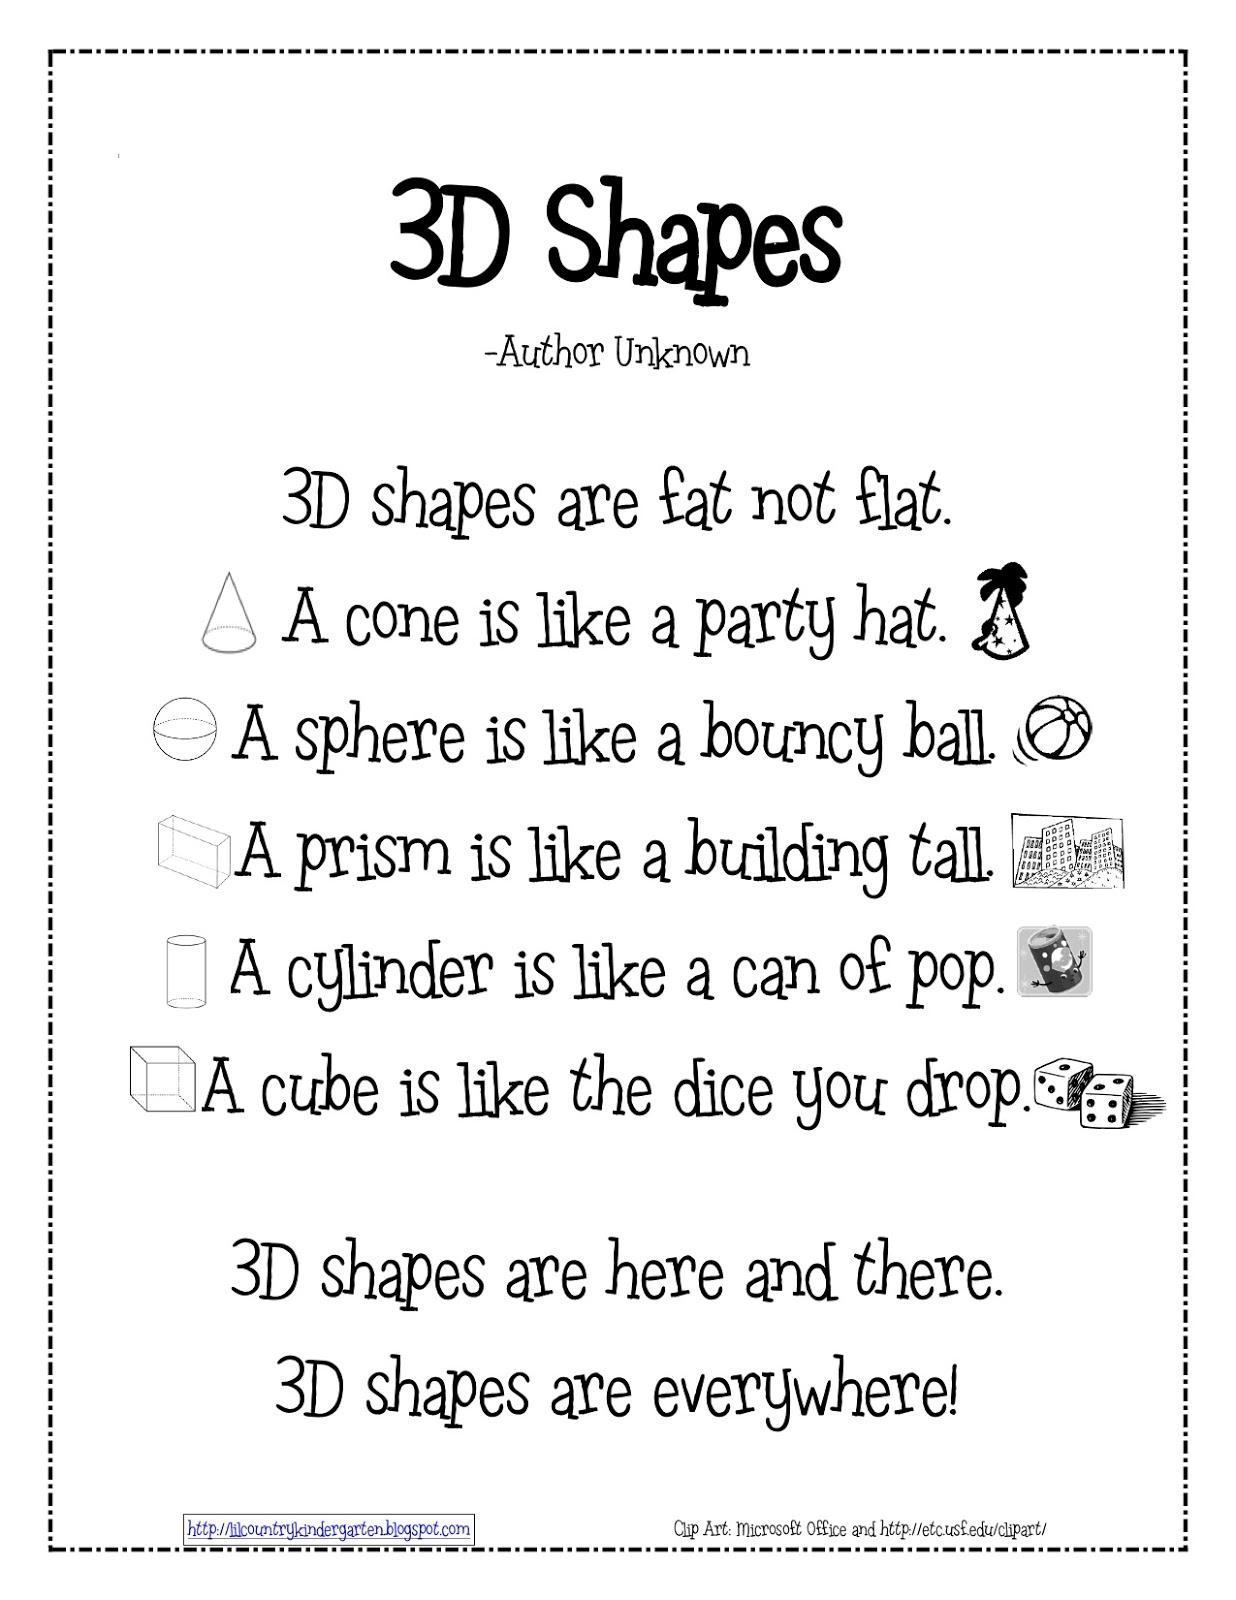 Kinder Learning Garden Teaching 3d Shapes